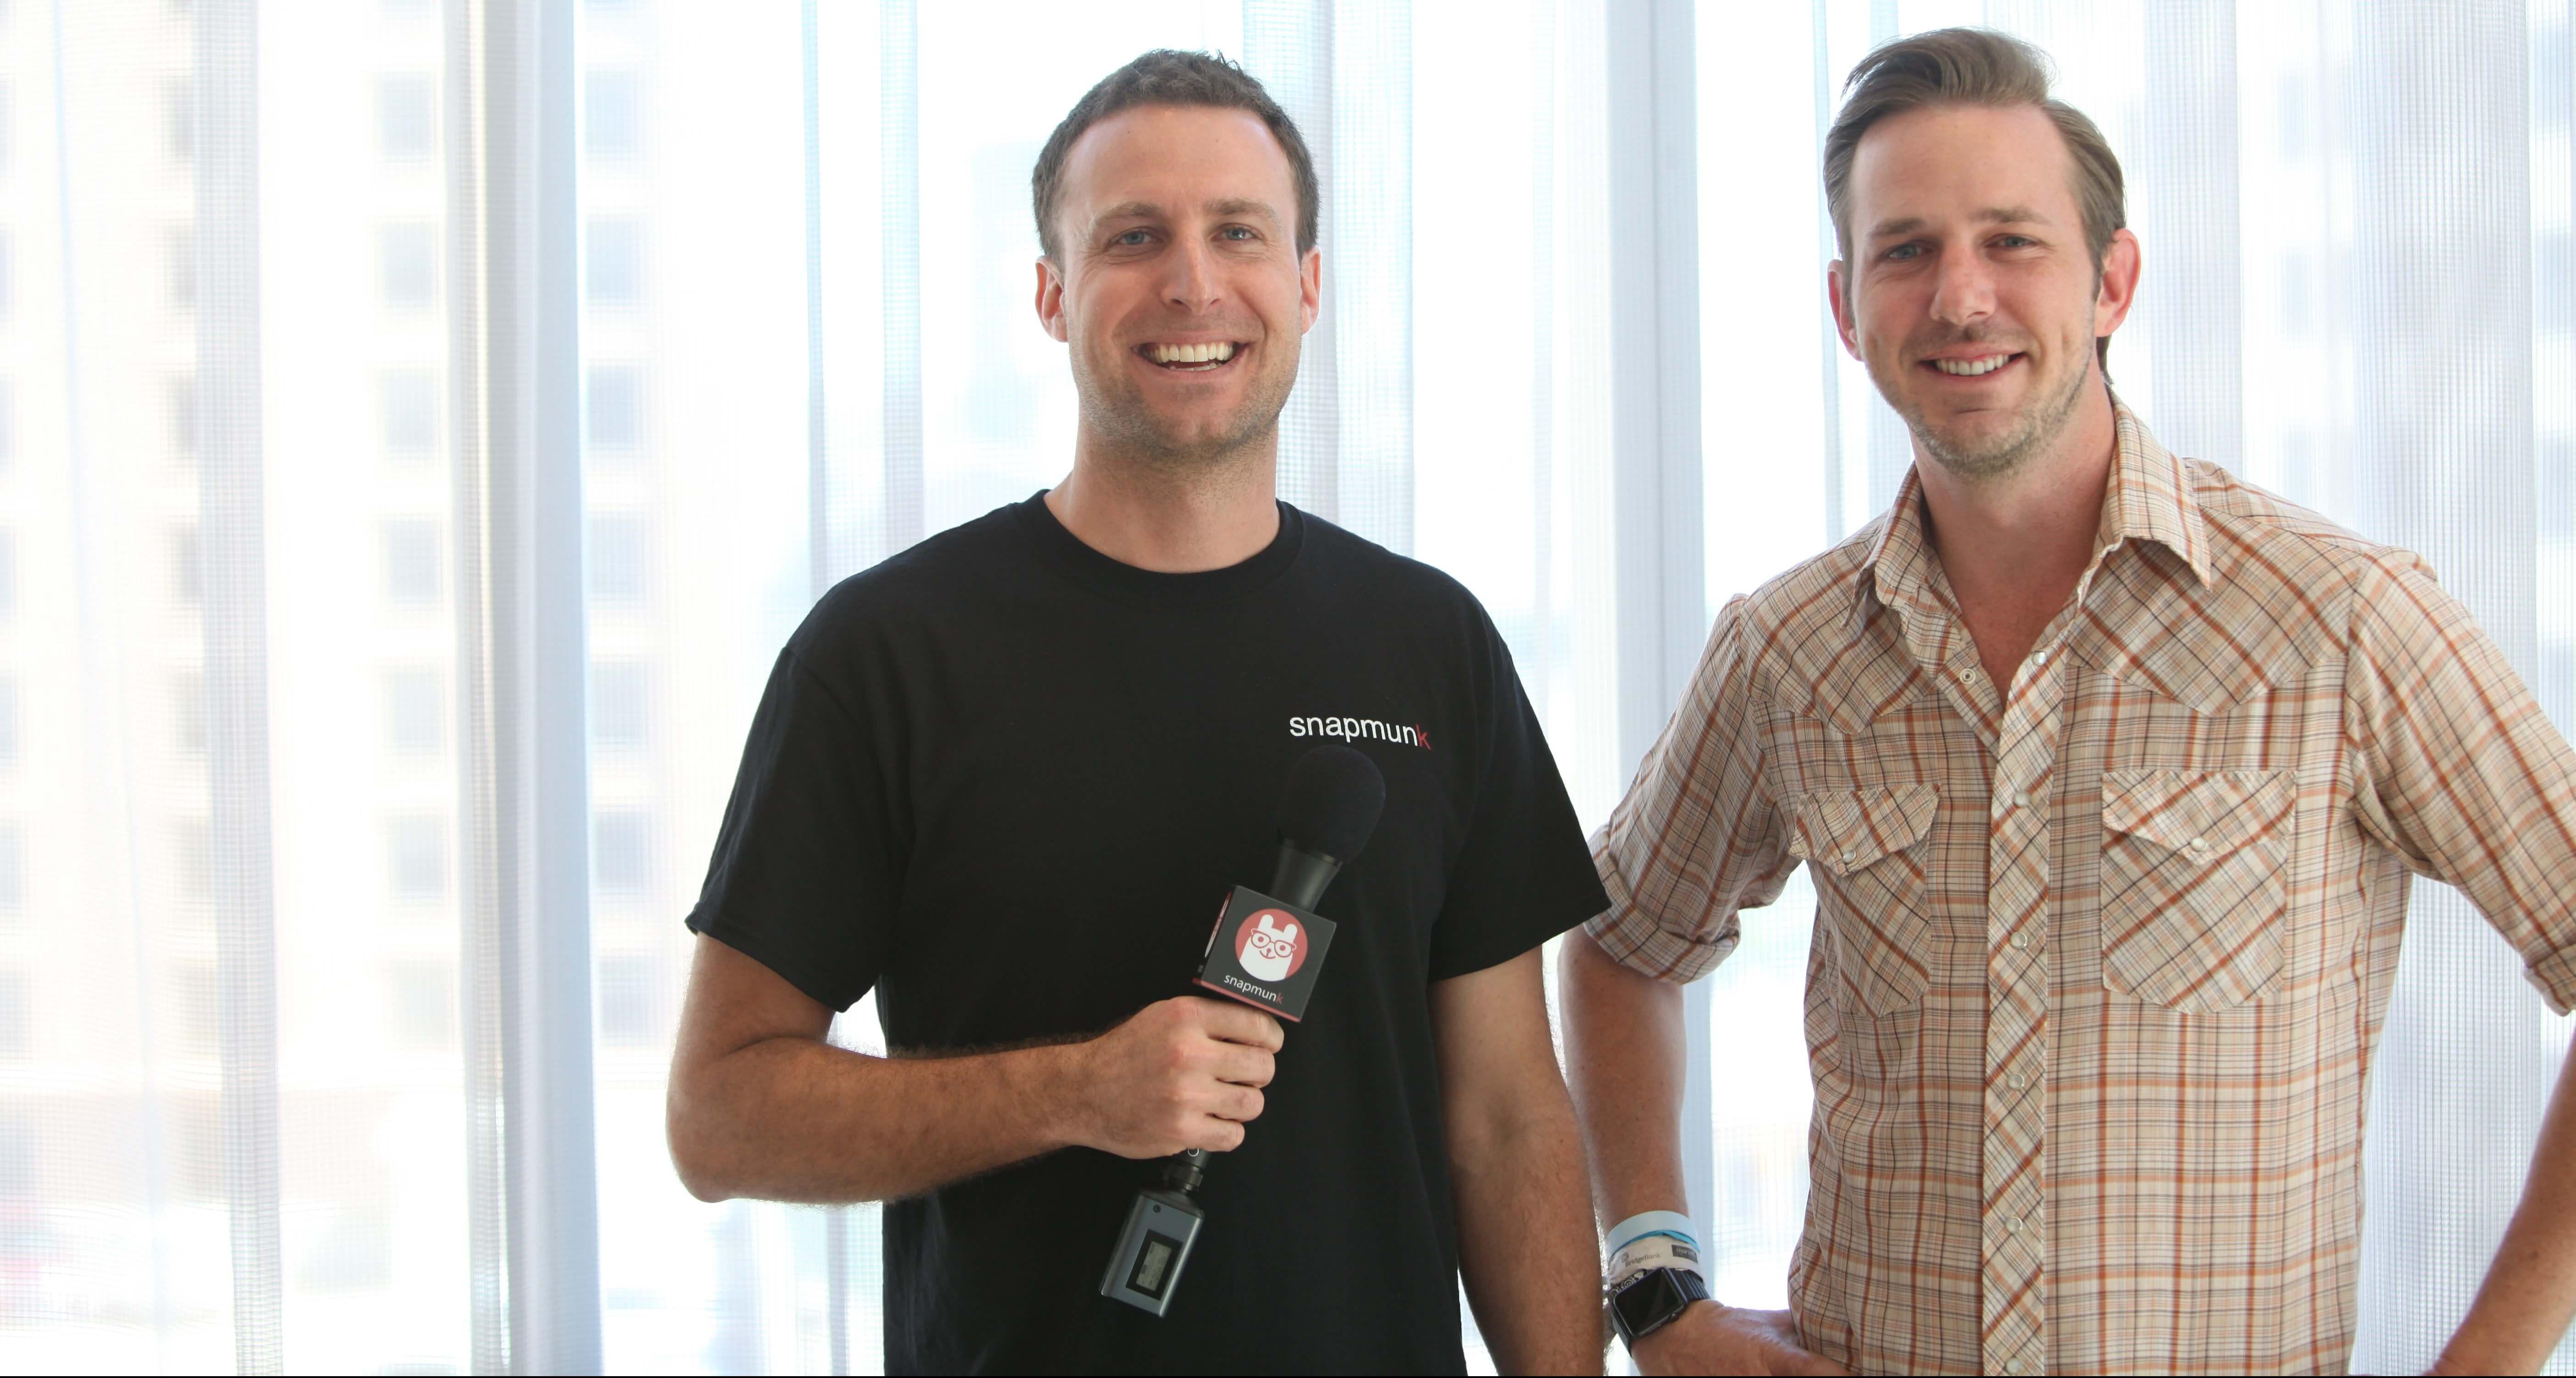 Mentors & Mischief: Interview w Hank Leber, Co-Founder of Vytmn